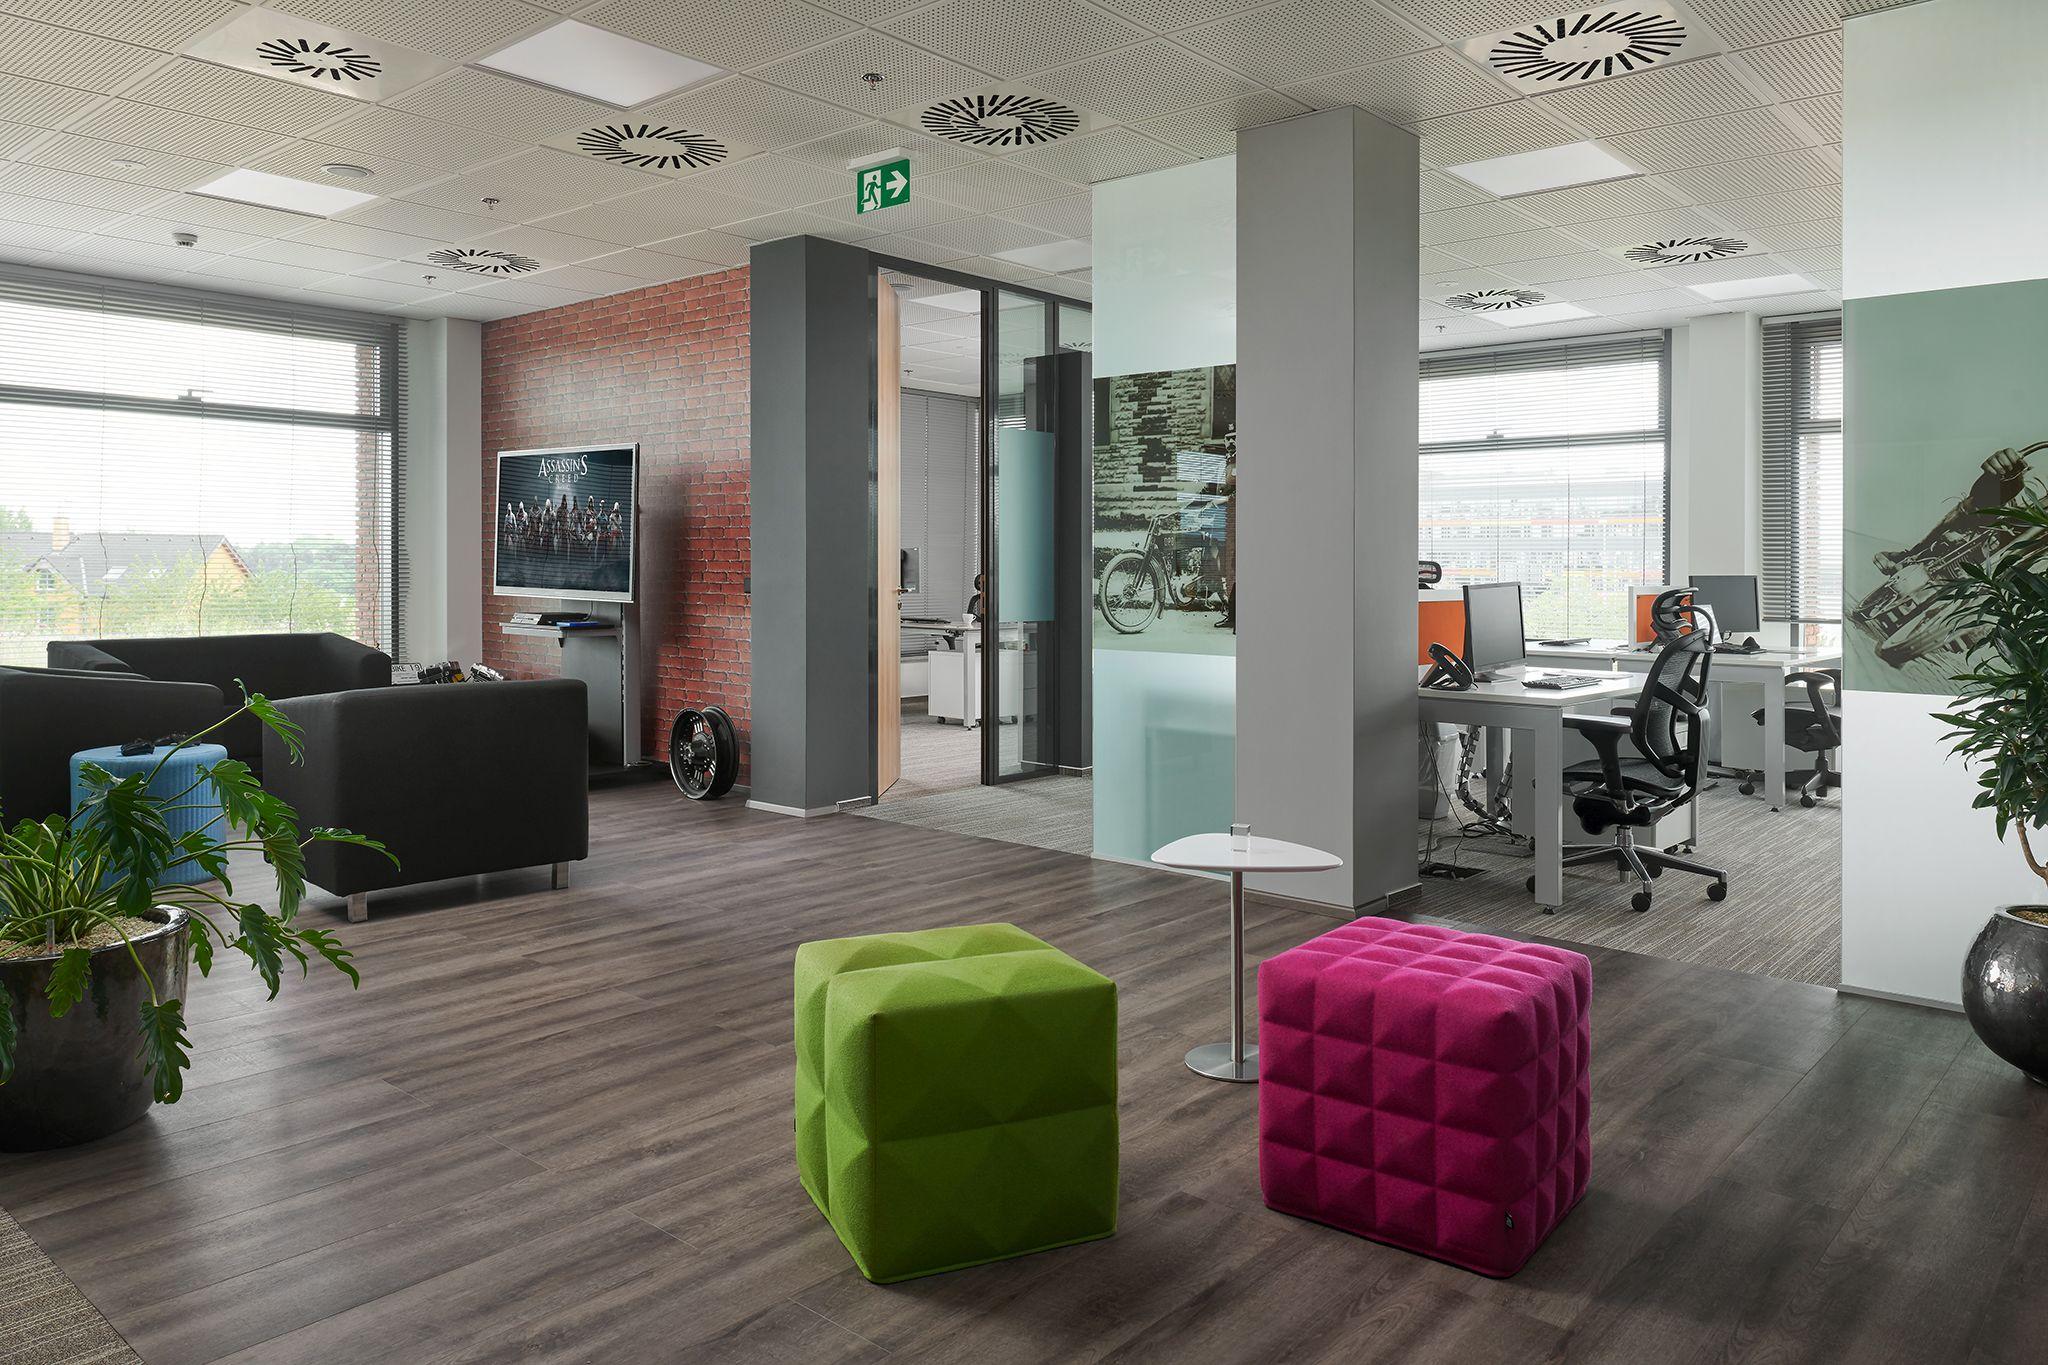 Harley Davidson office in Prague